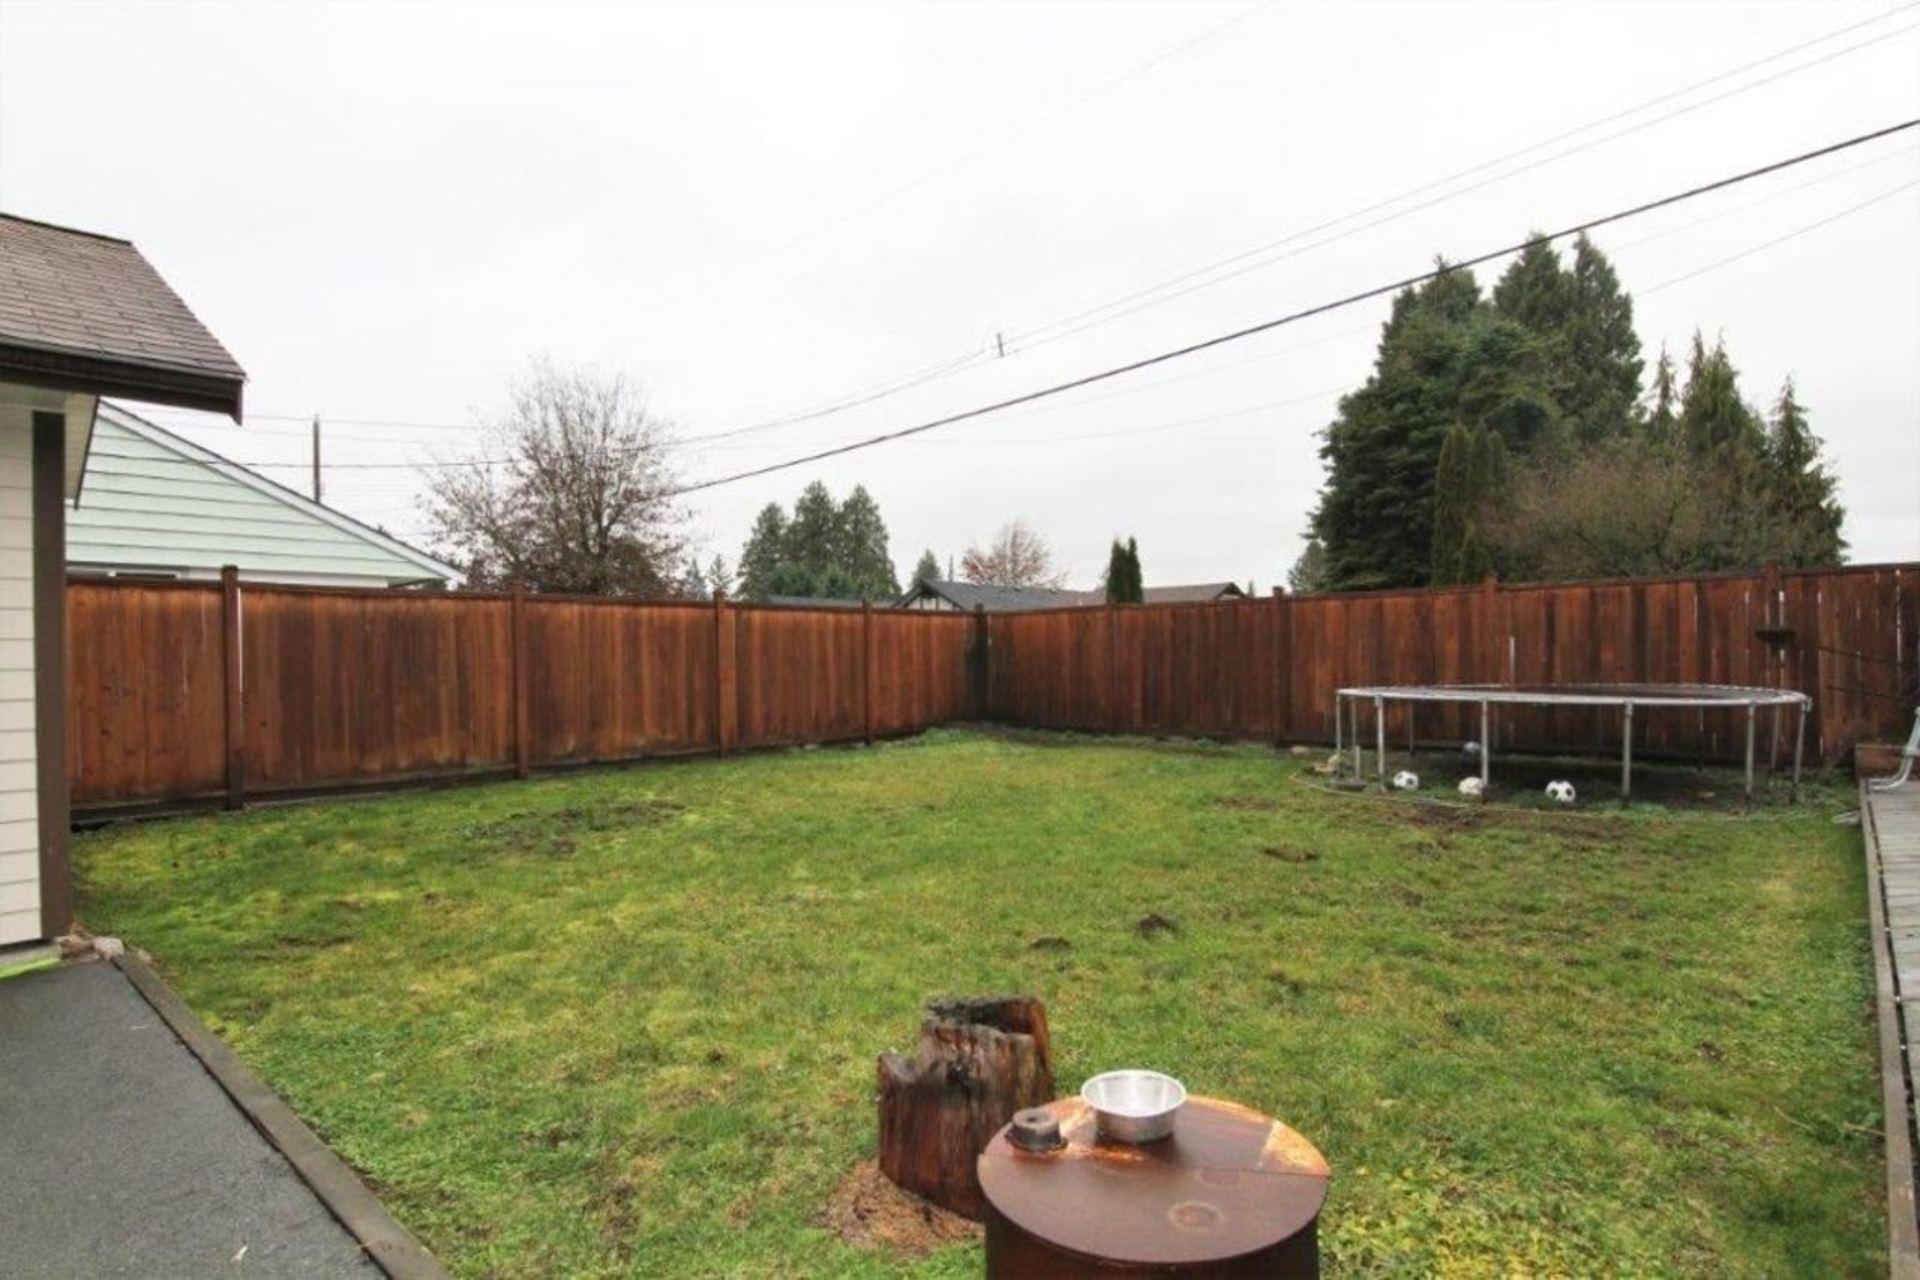 12351-203-street-west-central-maple-ridge-11 at 12351 203 Street, West Central, Maple Ridge